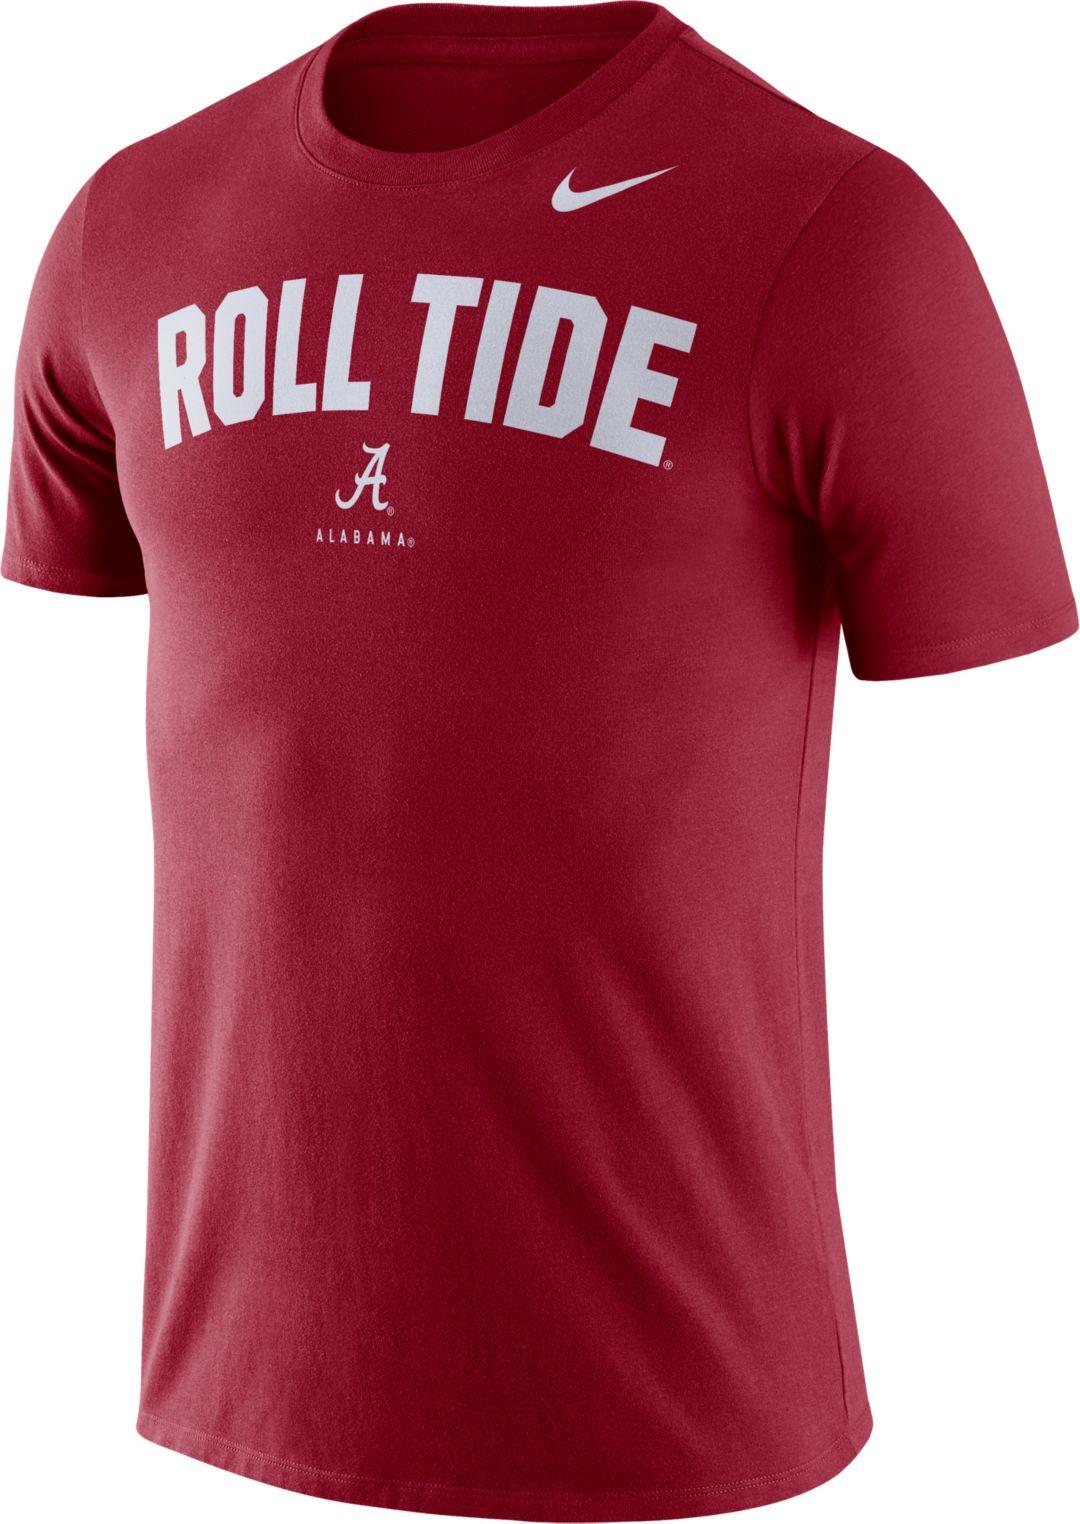 best service 9bca0 fa91d Nike Men's Alabama Crimson Tide Crimson Dri-FIT Phrase T-Shirt